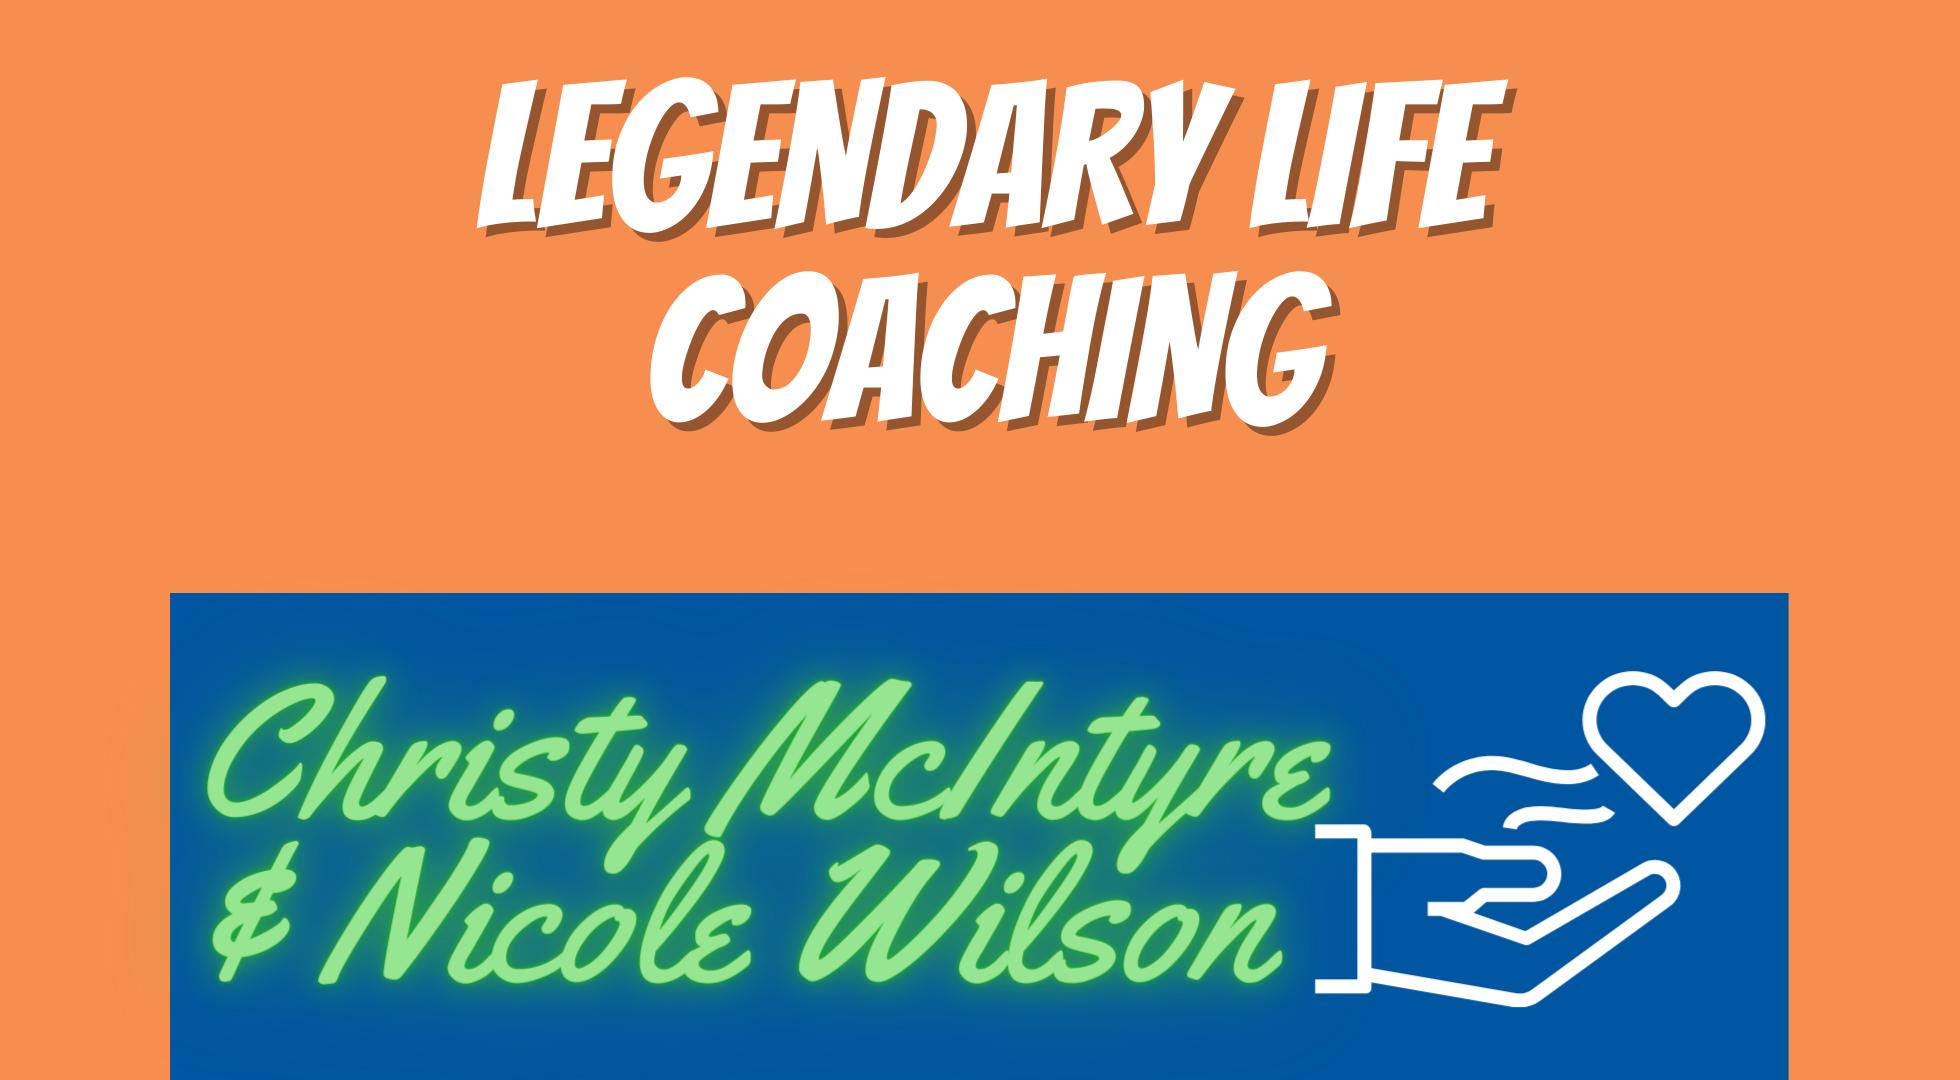 Legendary Life Coaching